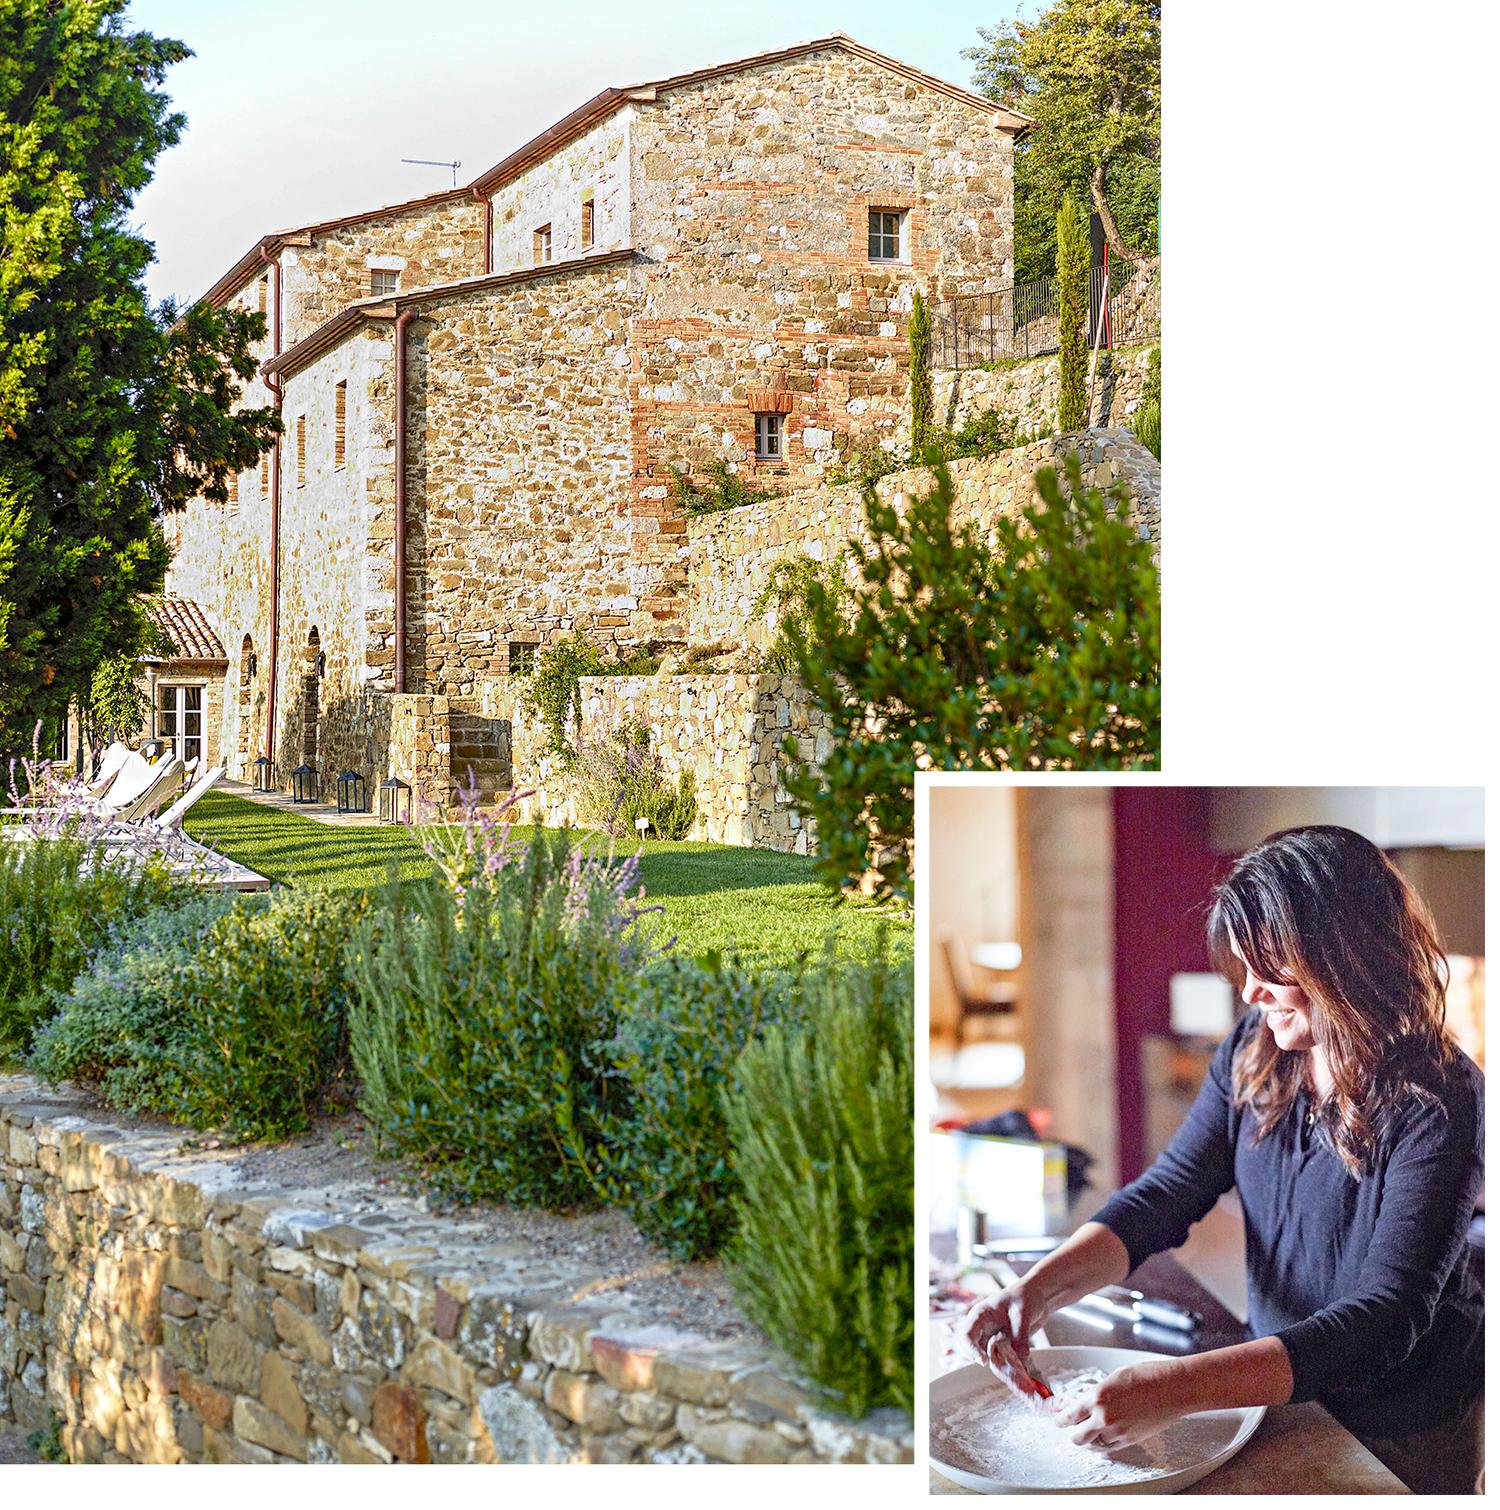 monteverdi tuscany culinary academy rachael ray